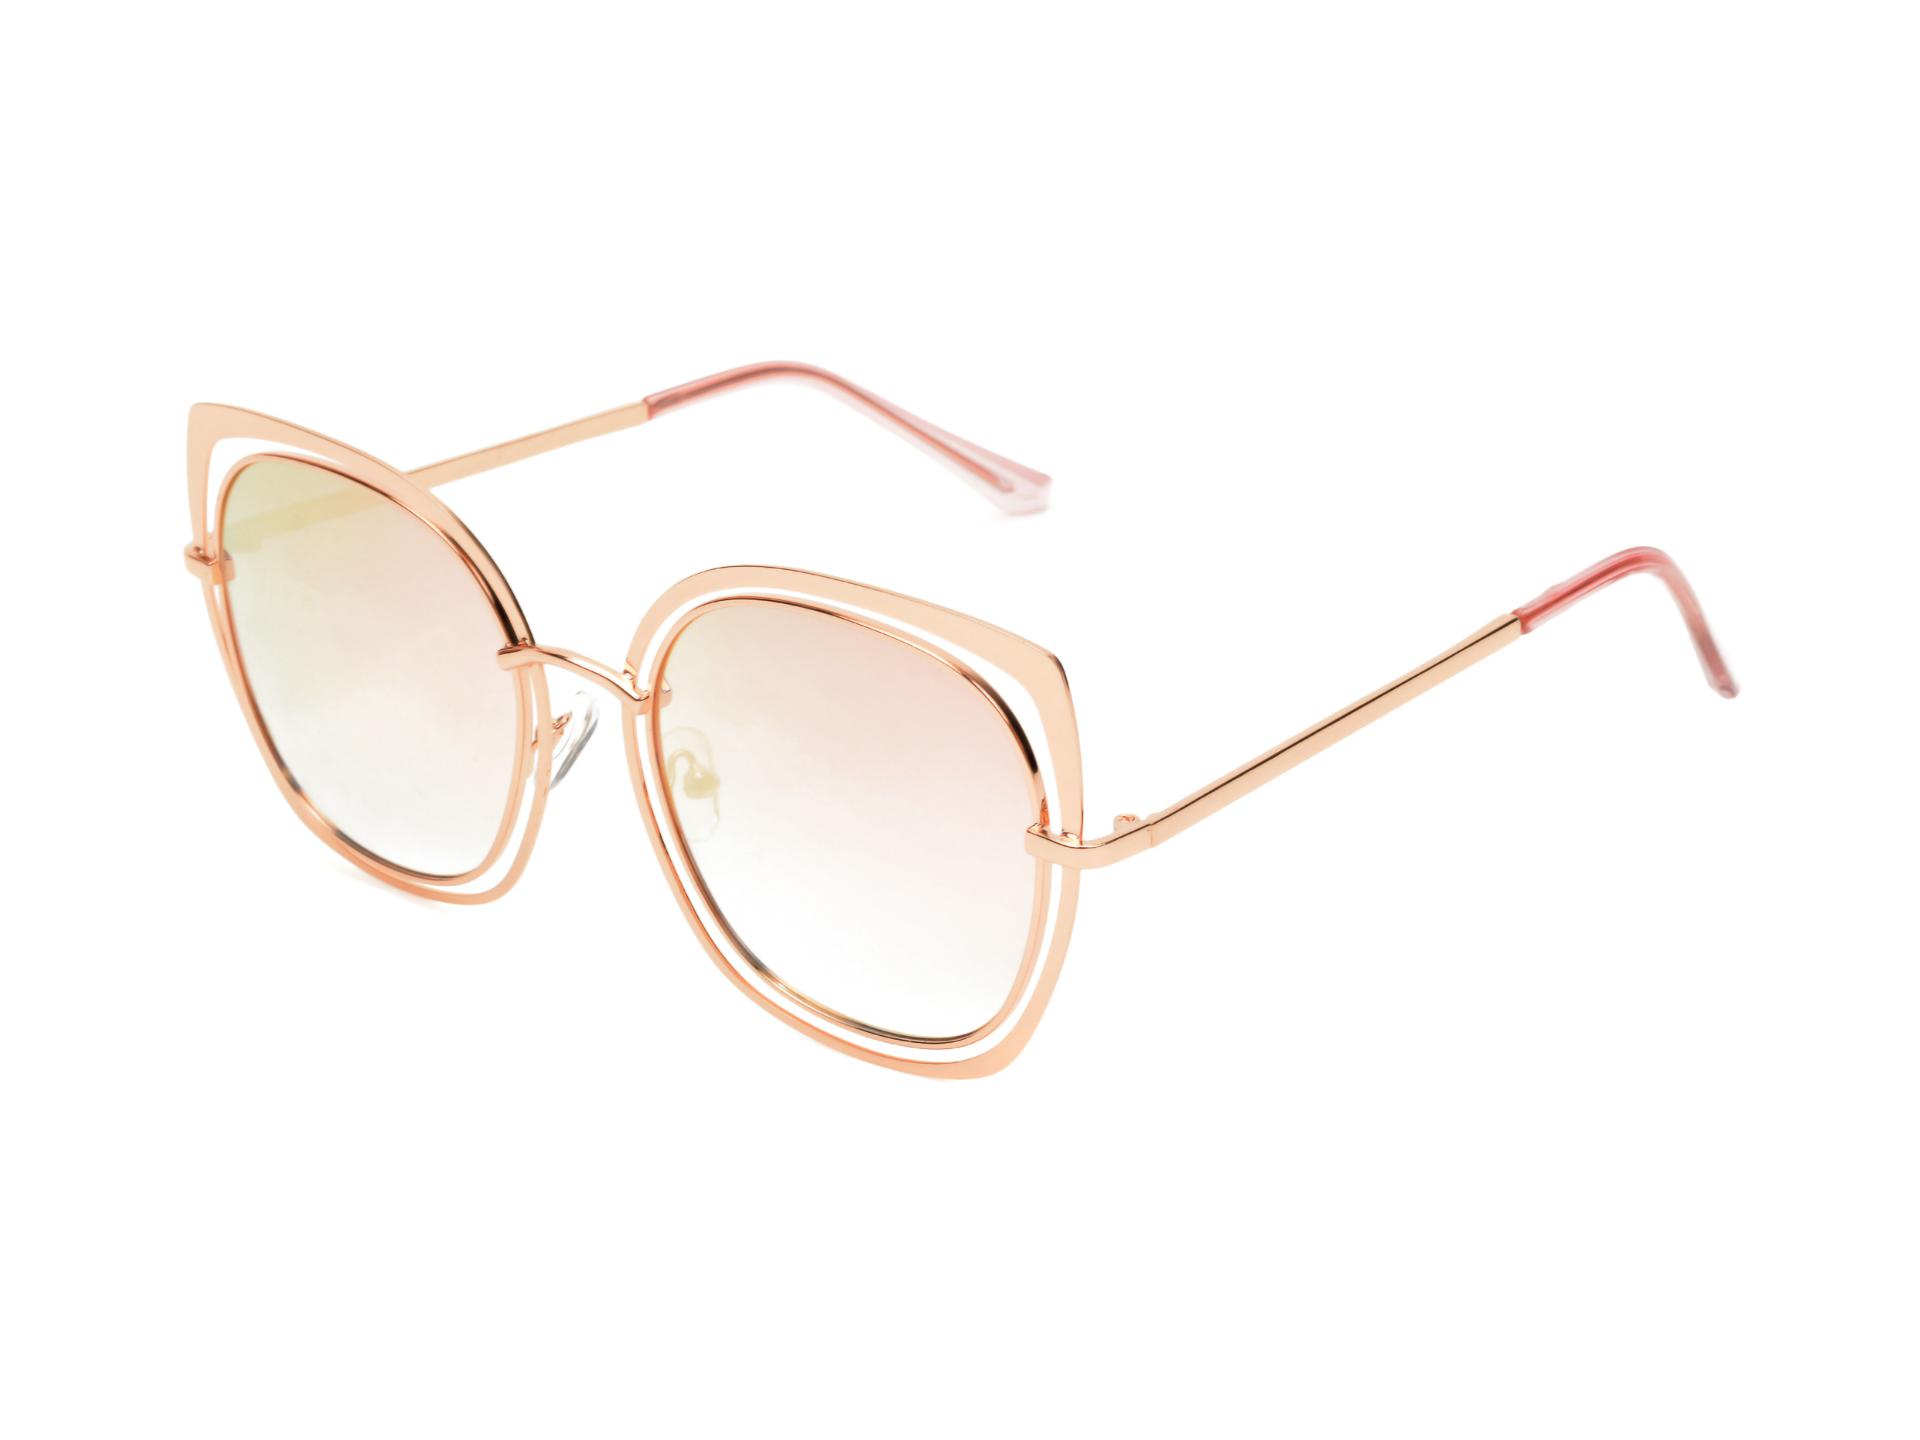 Ochelari de soare ALDO roz, Truls653, din PVC imagine